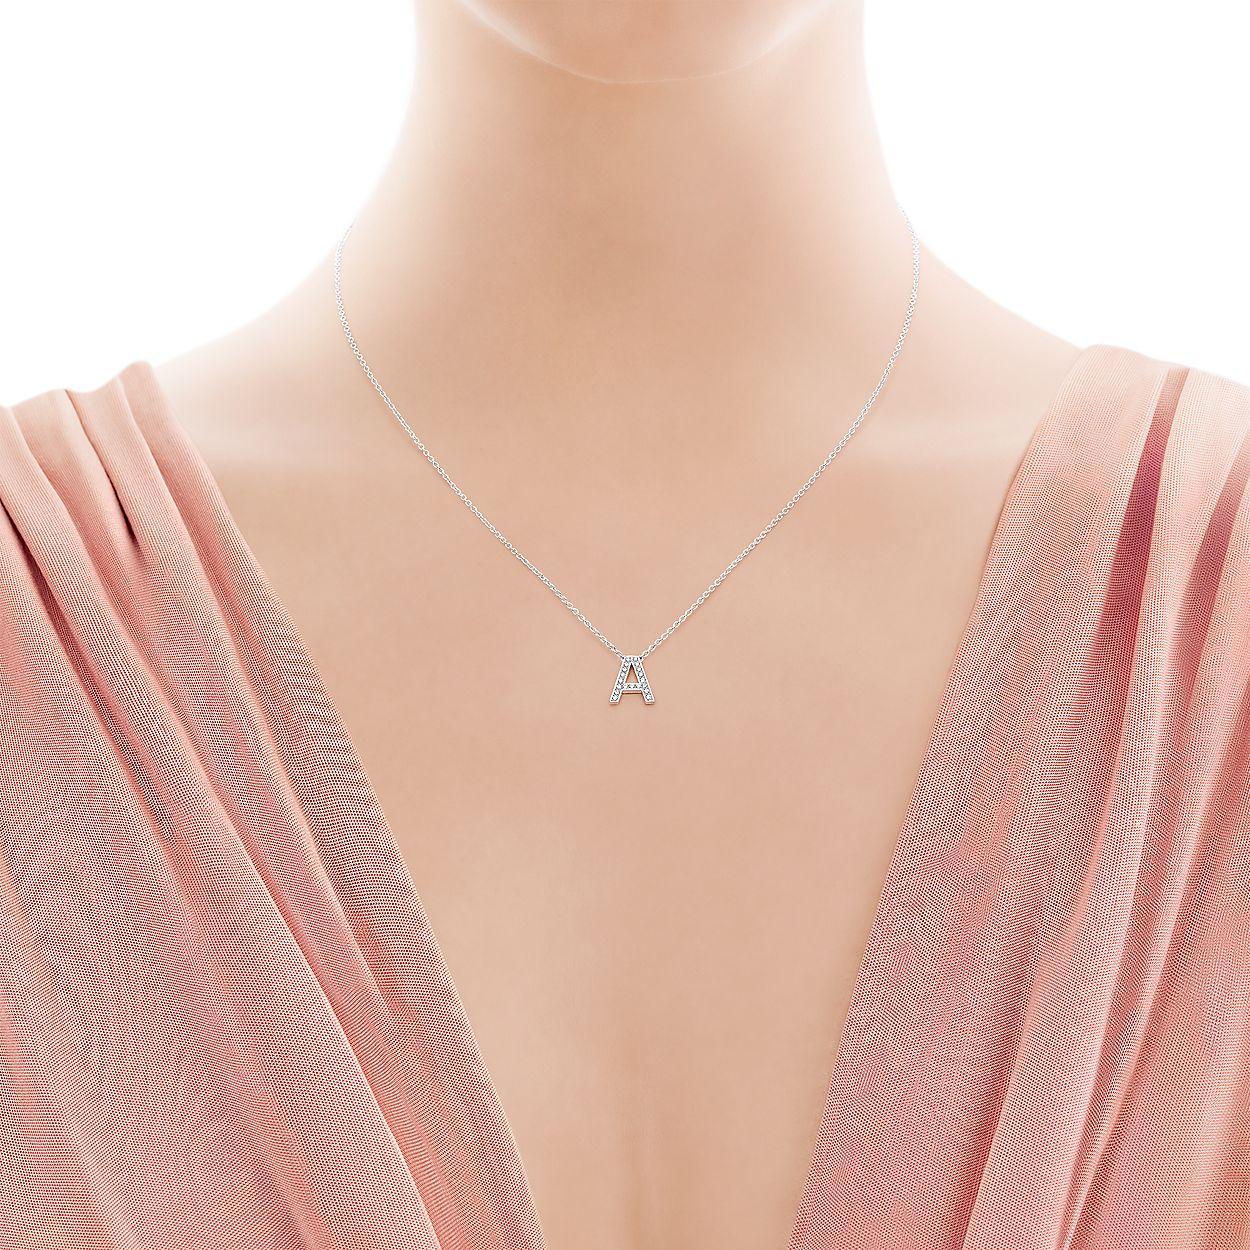 c664d8deb Tiffany Letters pendant of diamonds in platinum, mini. Letters A-Z ...